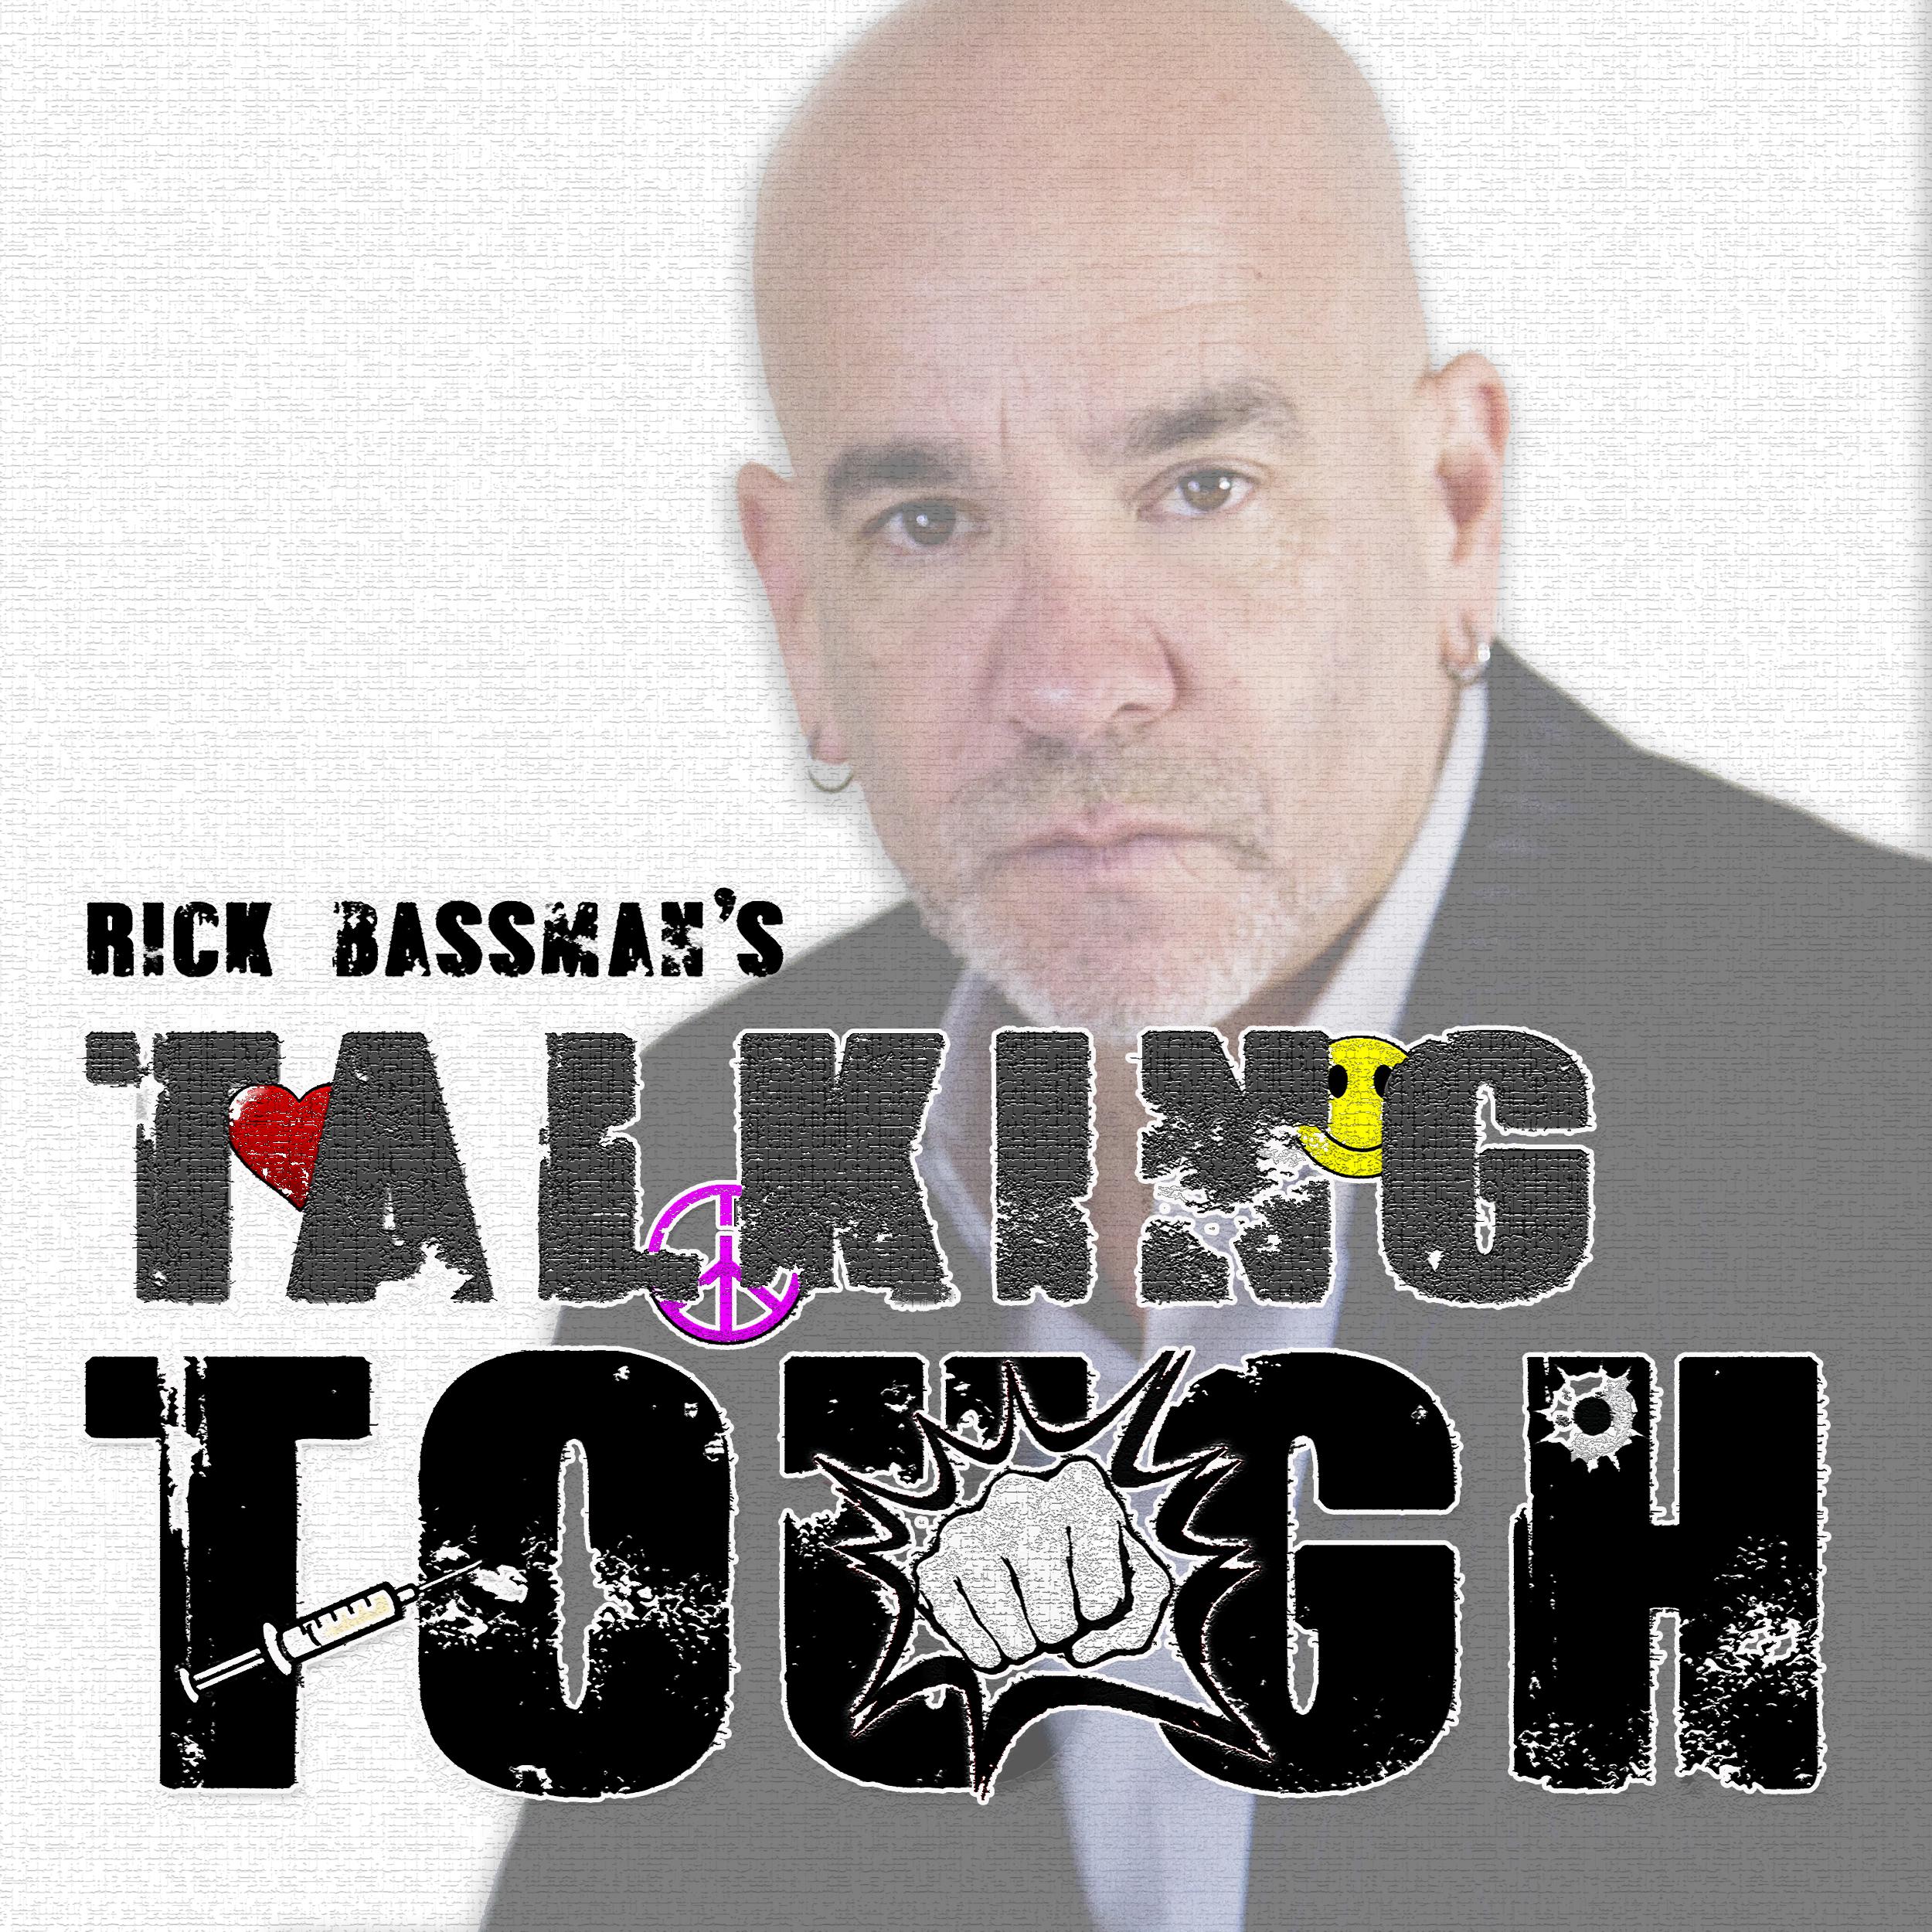 Rick Bassman's Talking Tough